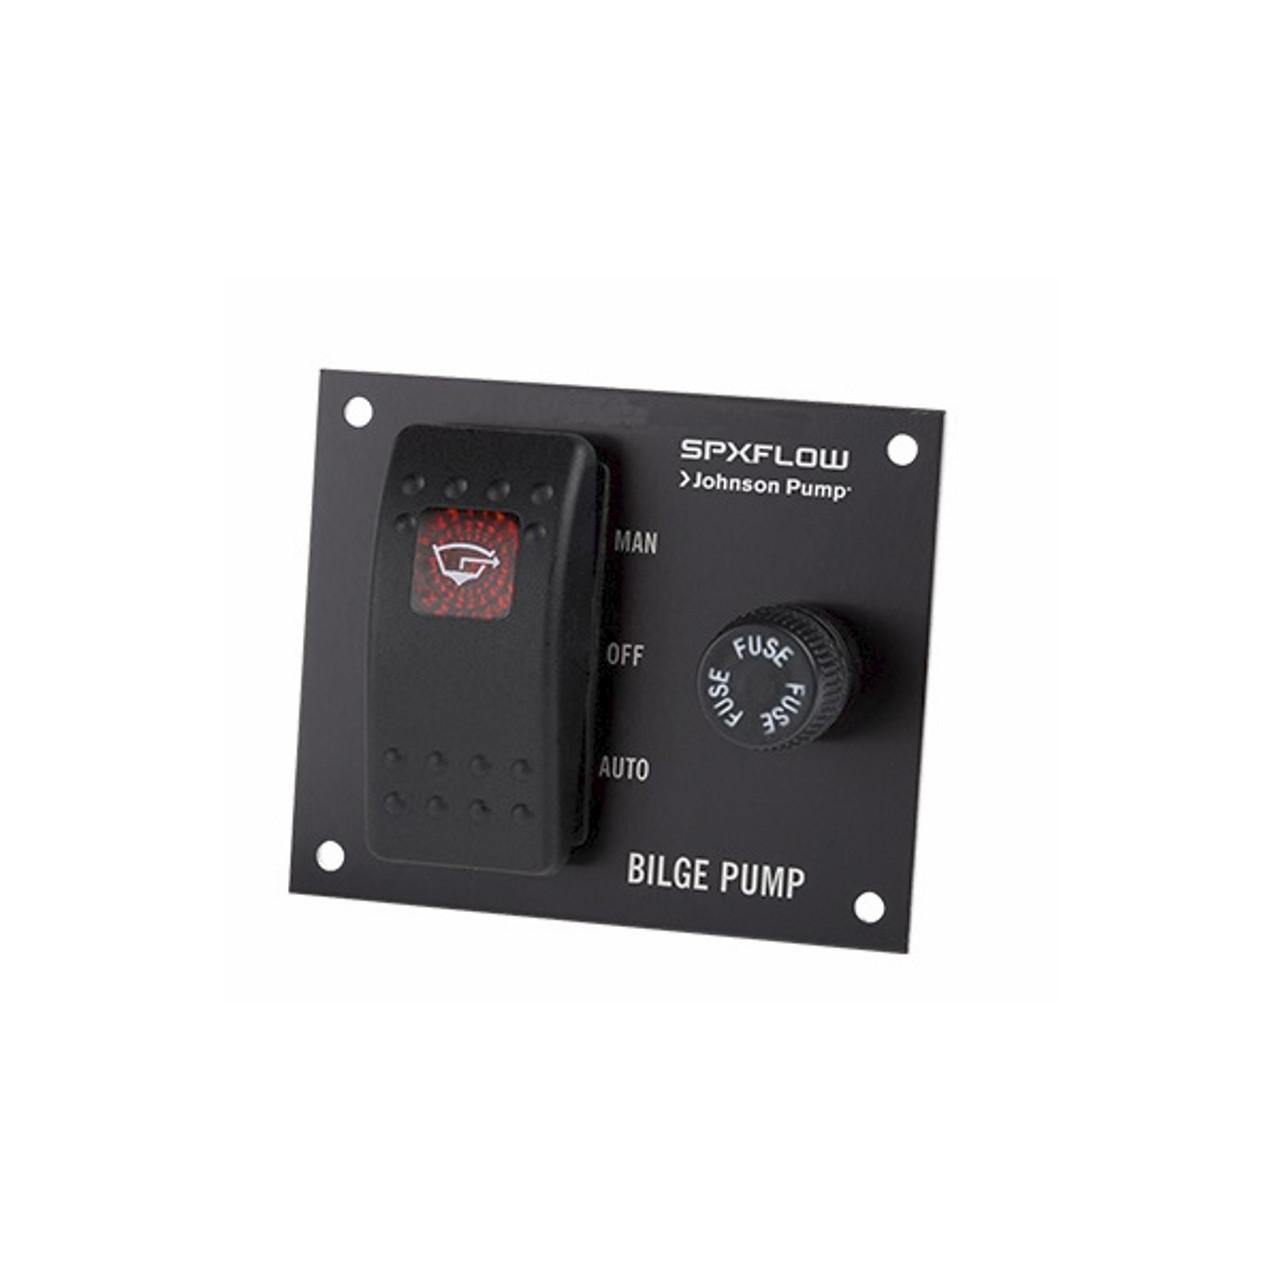 Johnson Pumps 82044 Bilge Pump 3-Way Panel Switch 12V